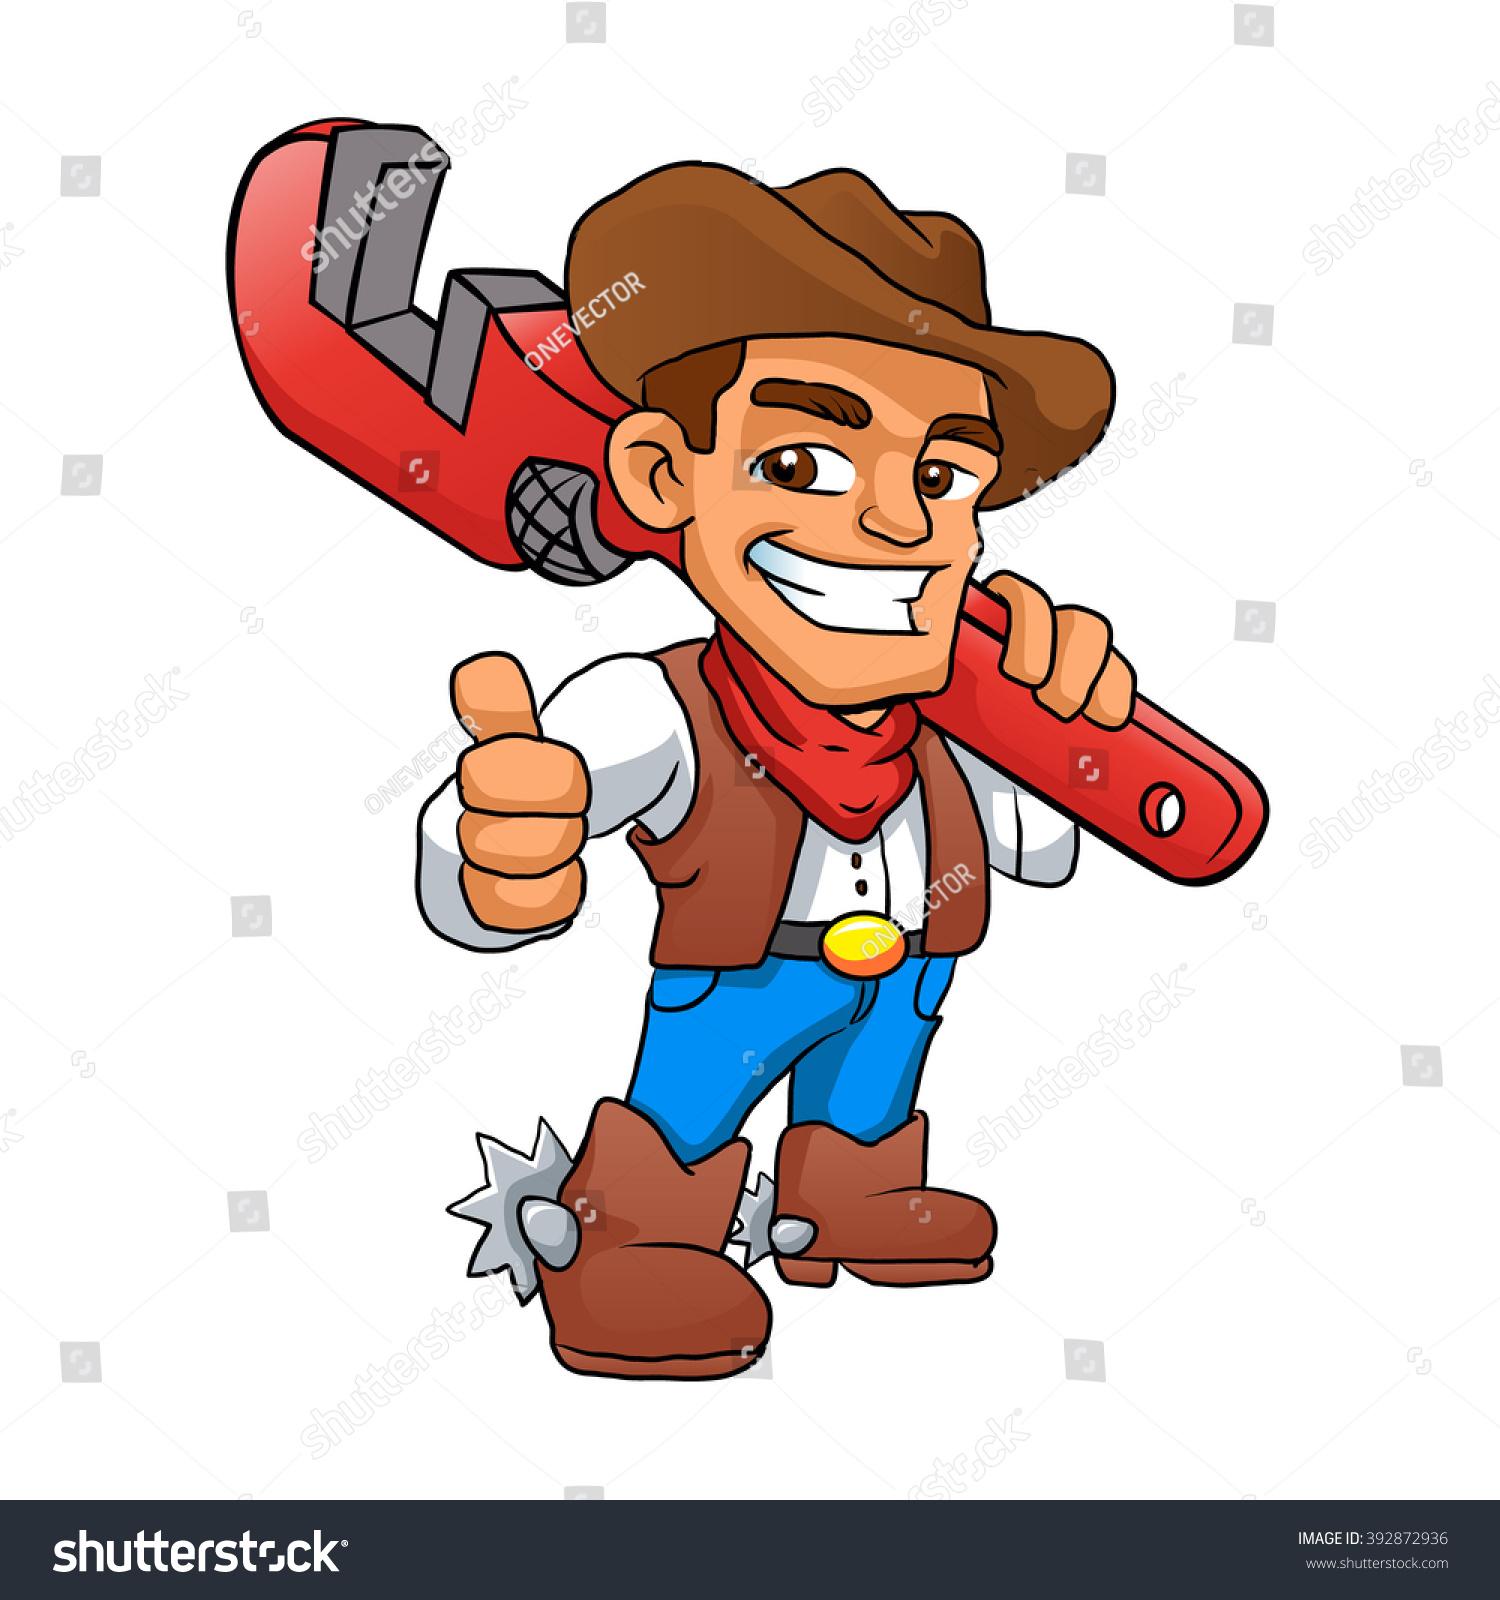 Plumber Cowboyhandyman Cowboy Stock Vector 392872936 - Shutterstock